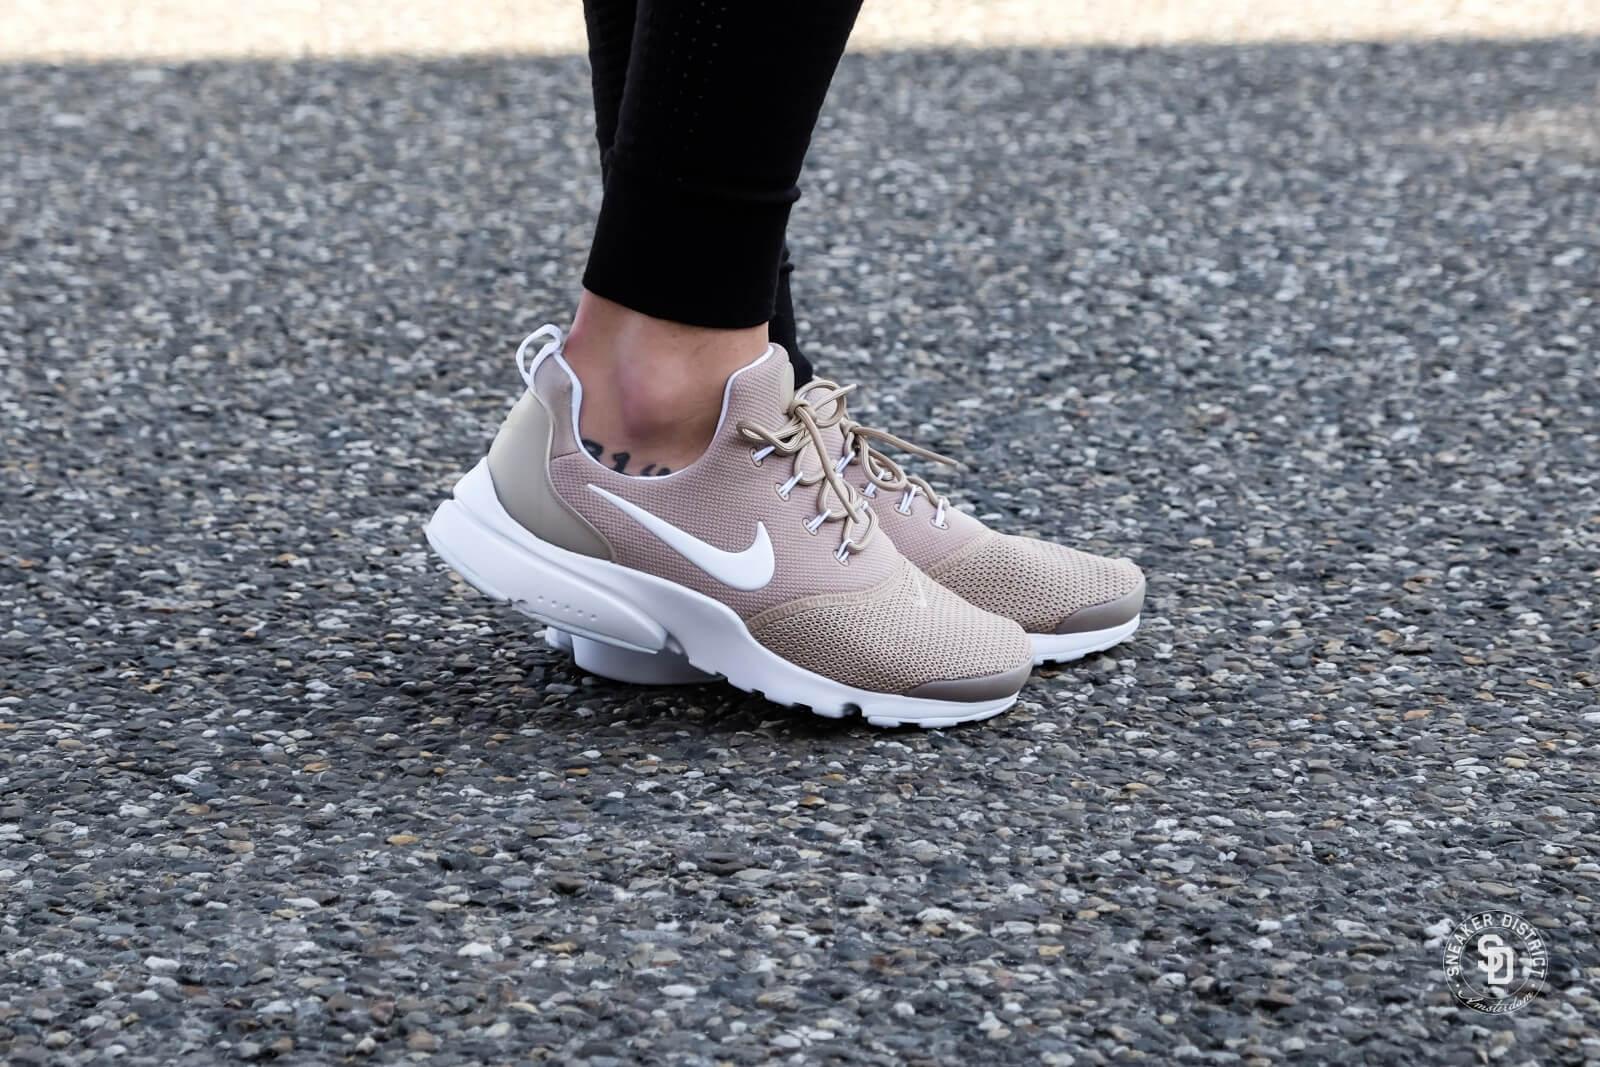 Nike Women's Presto Fly Sand/White